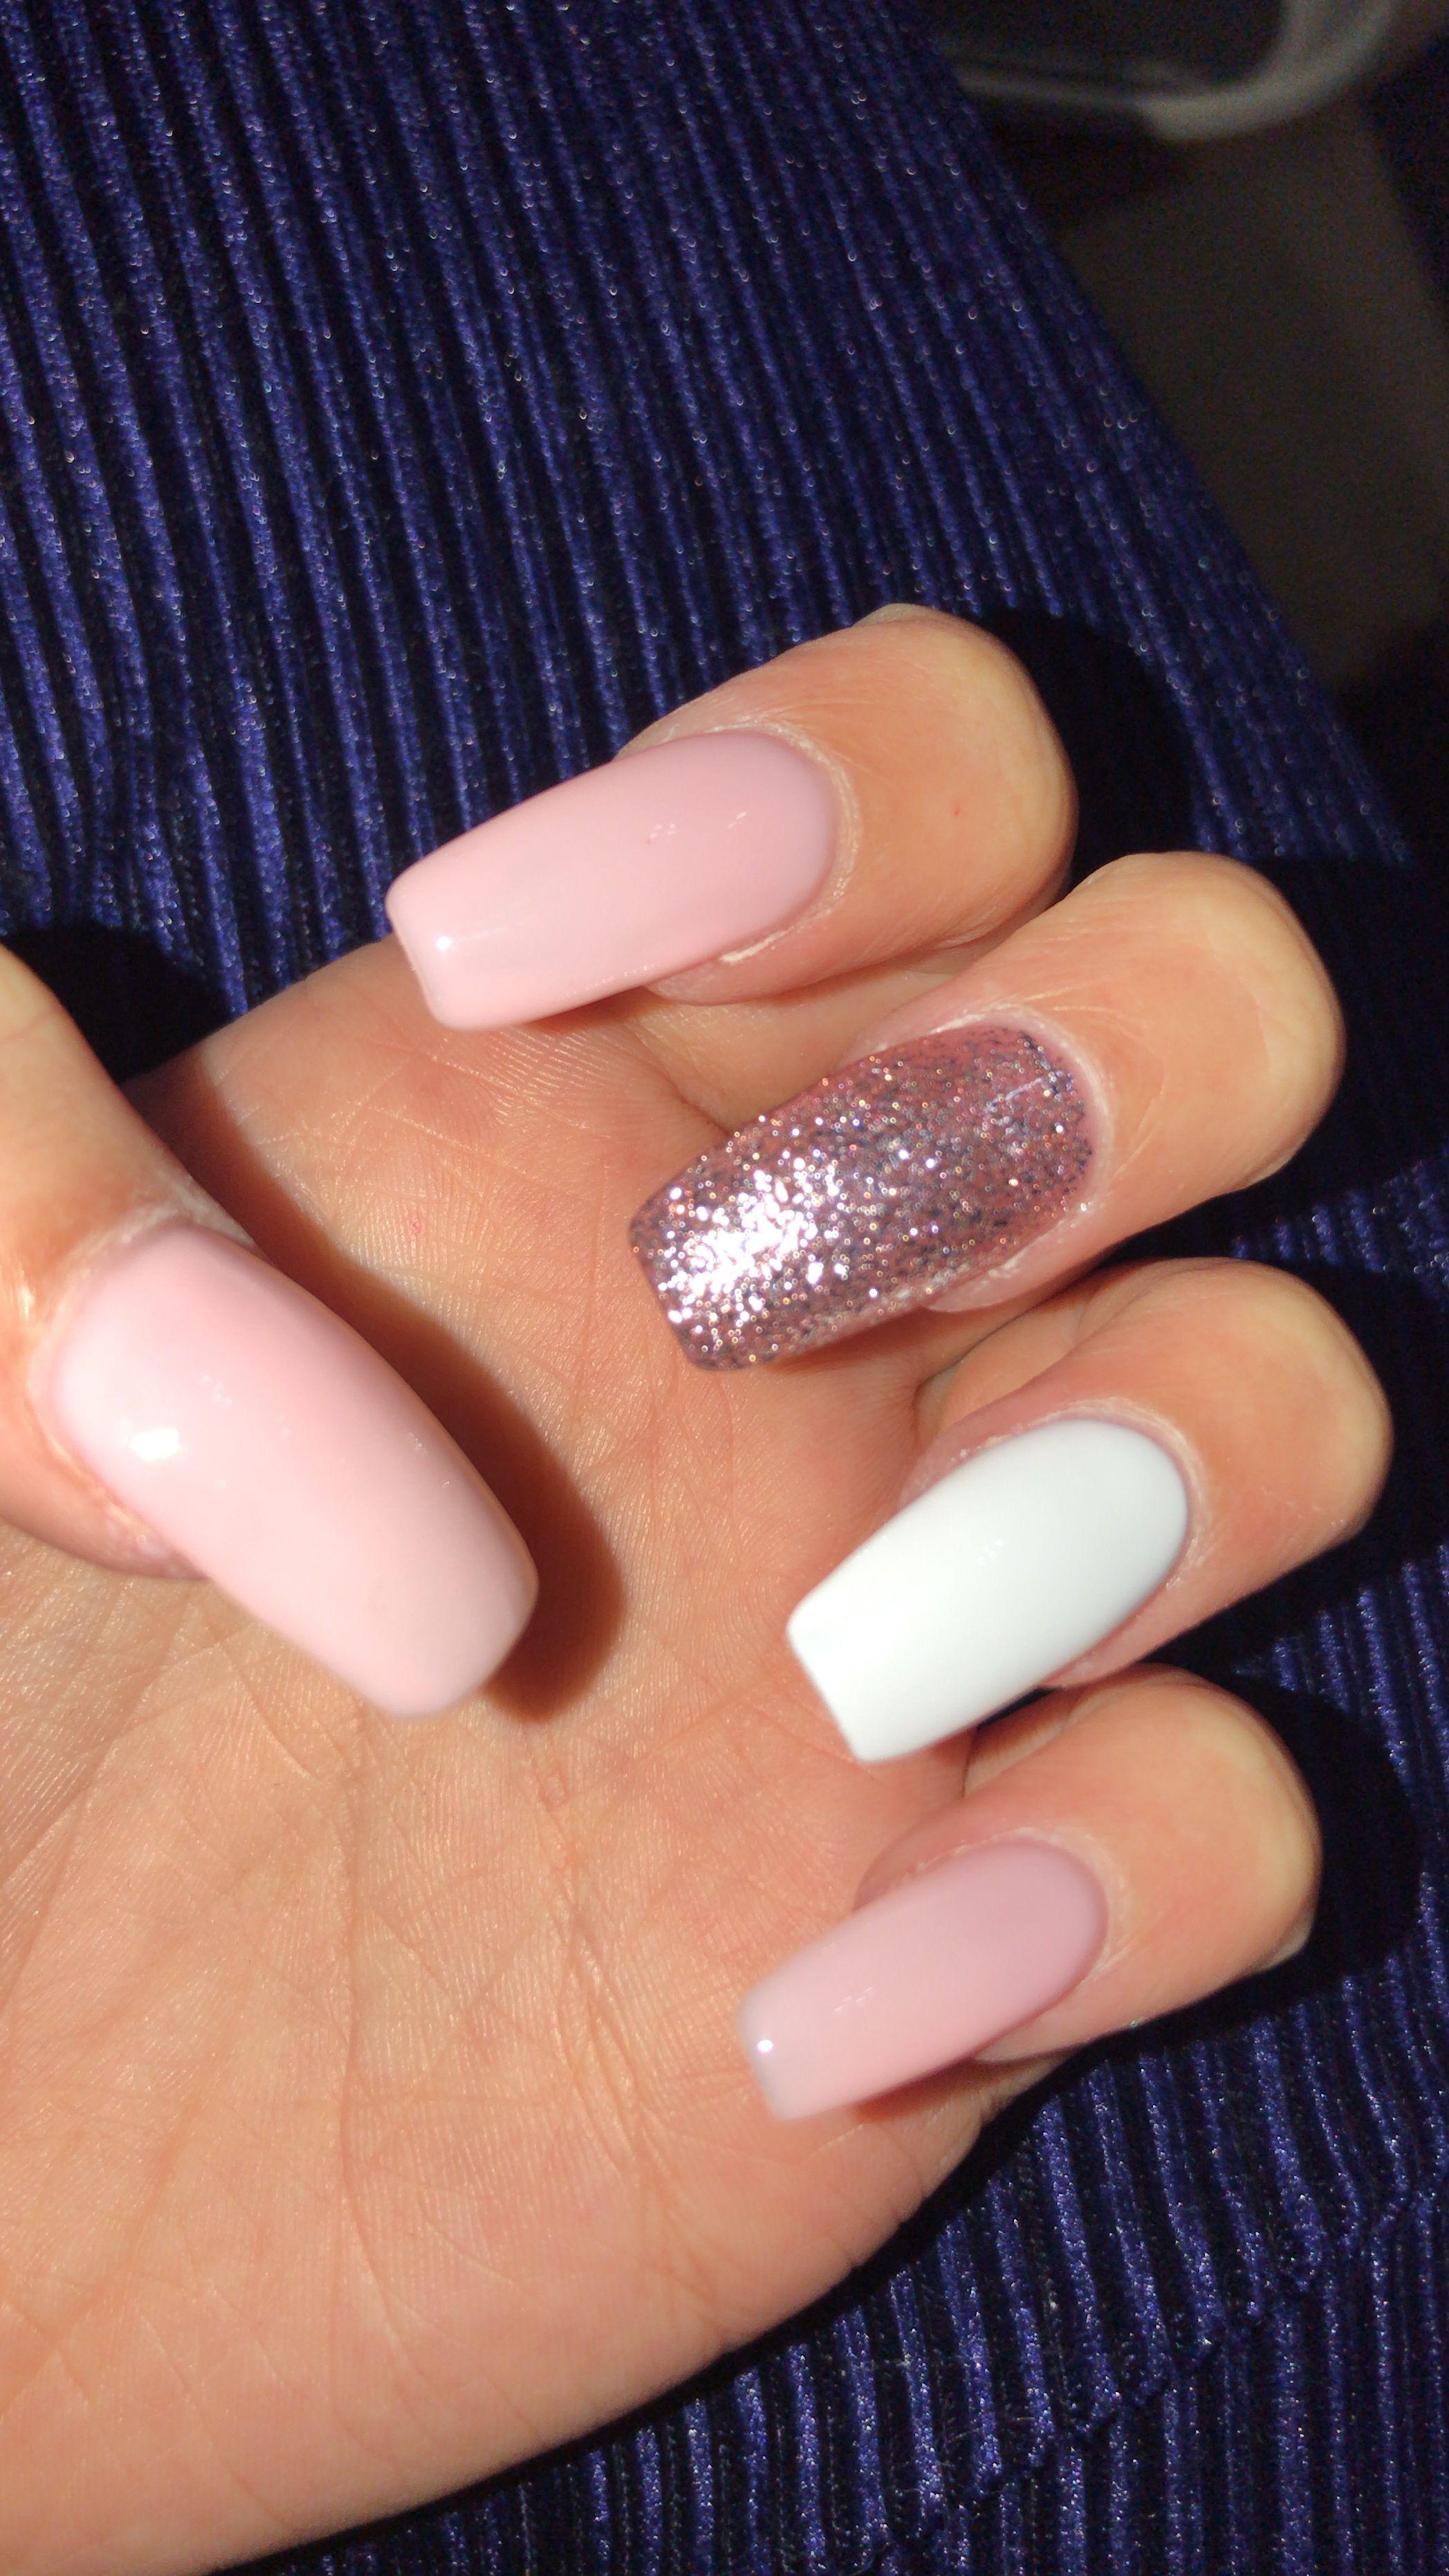 Pink White And Glitter Nails Pink Acrylic Nails Pale Pink Nails Blush Pink Nails